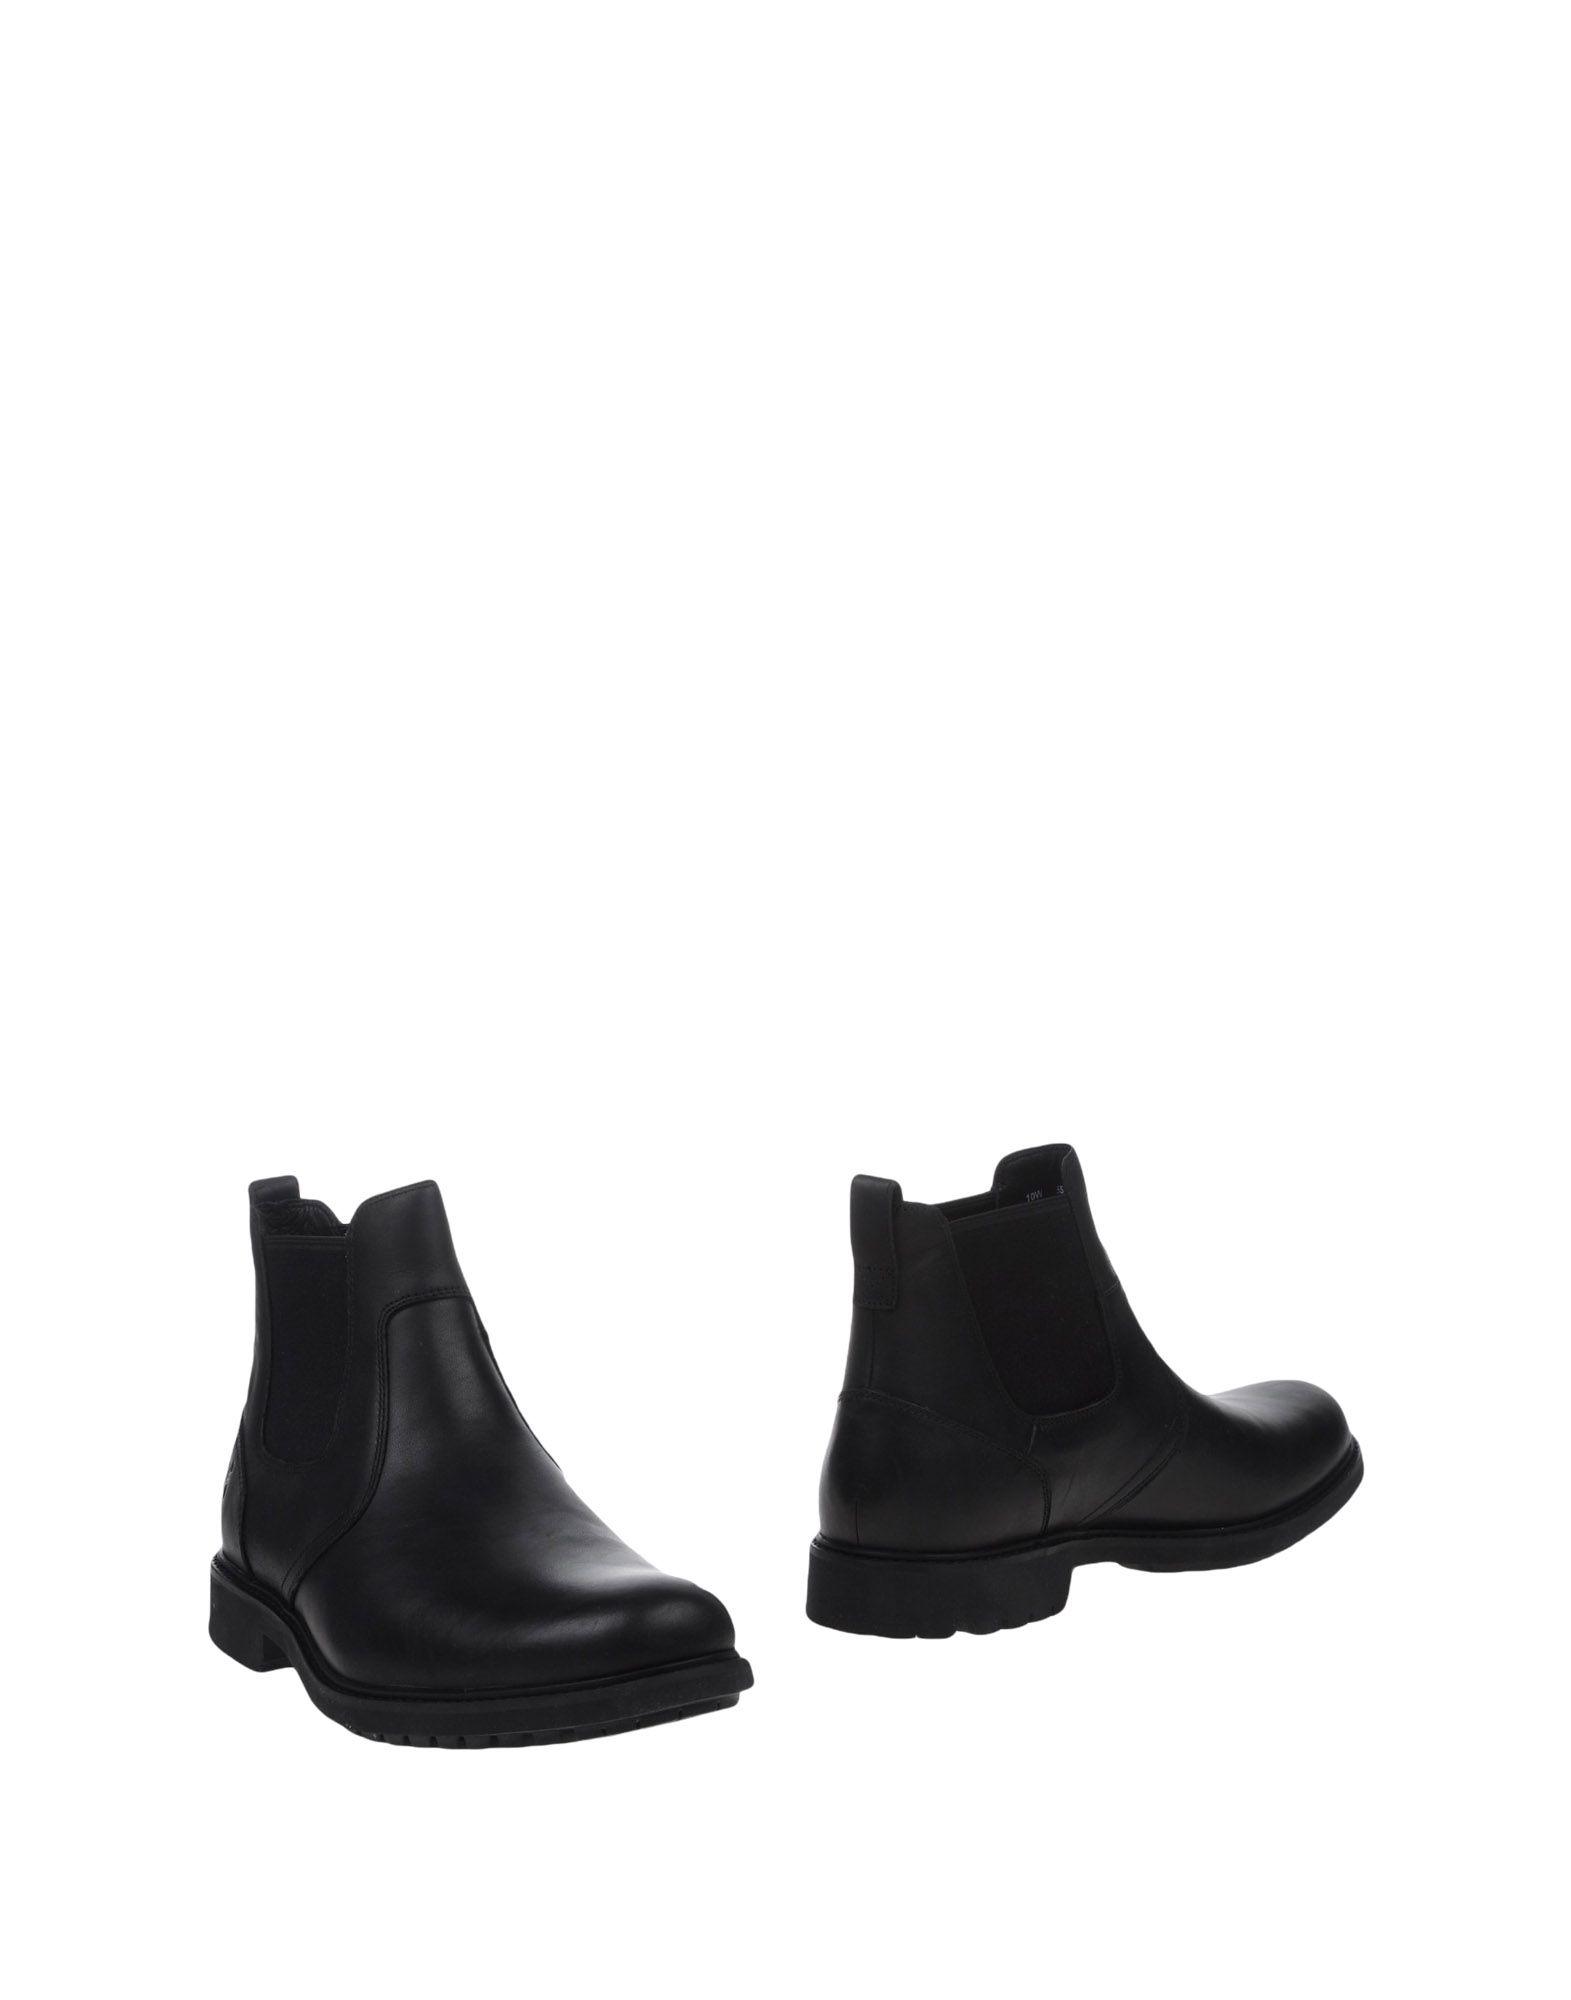 Фото - TIMBERLAND Полусапоги и высокие ботинки accademia полусапоги и высокие ботинки